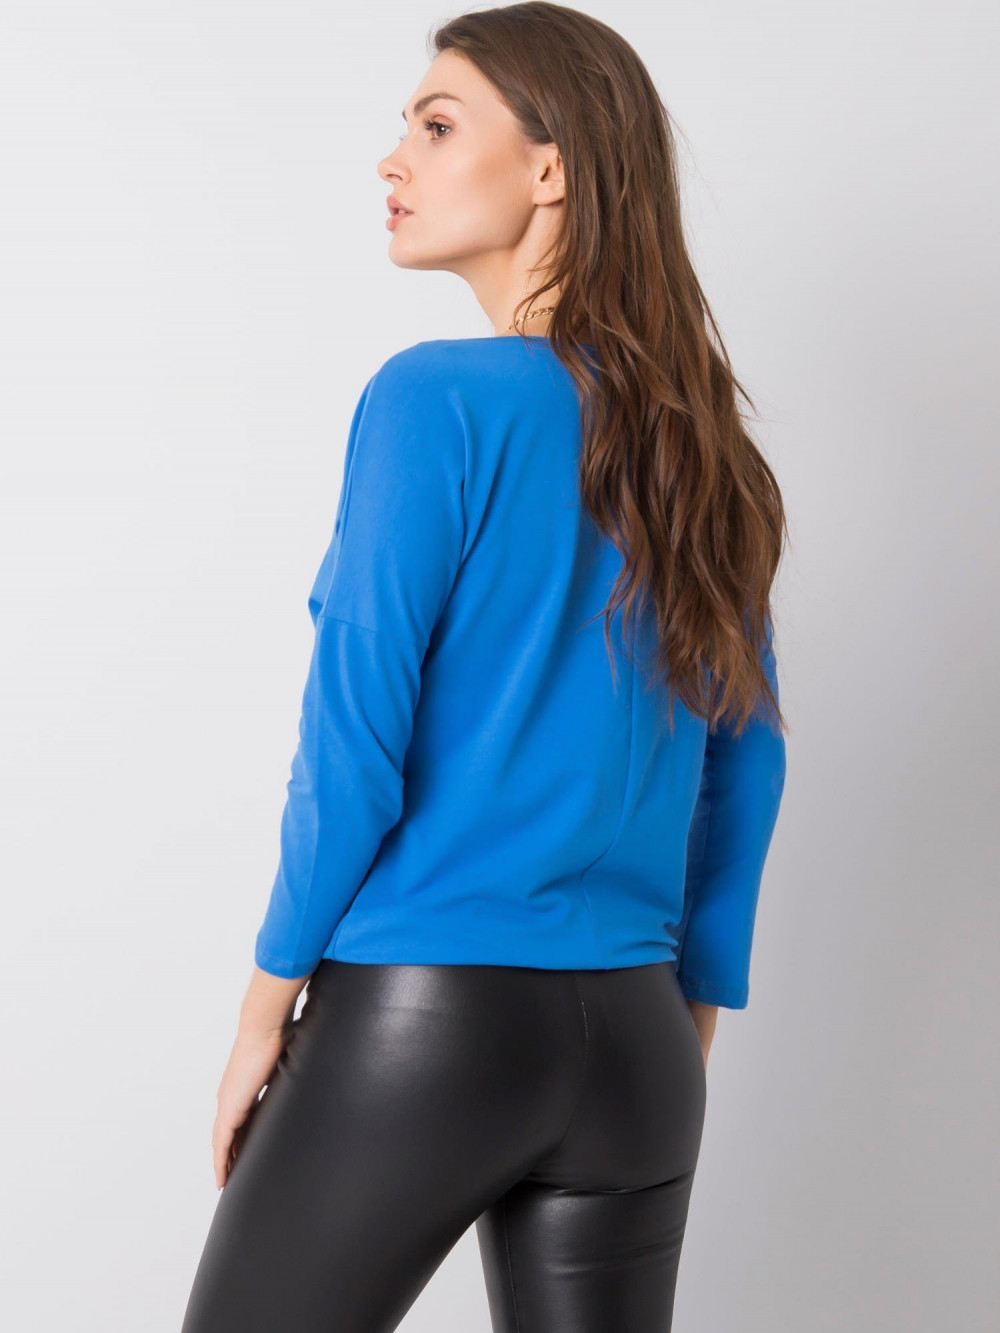 Ciemnoniebieska bluzka ze ściągaczem Taurus 5